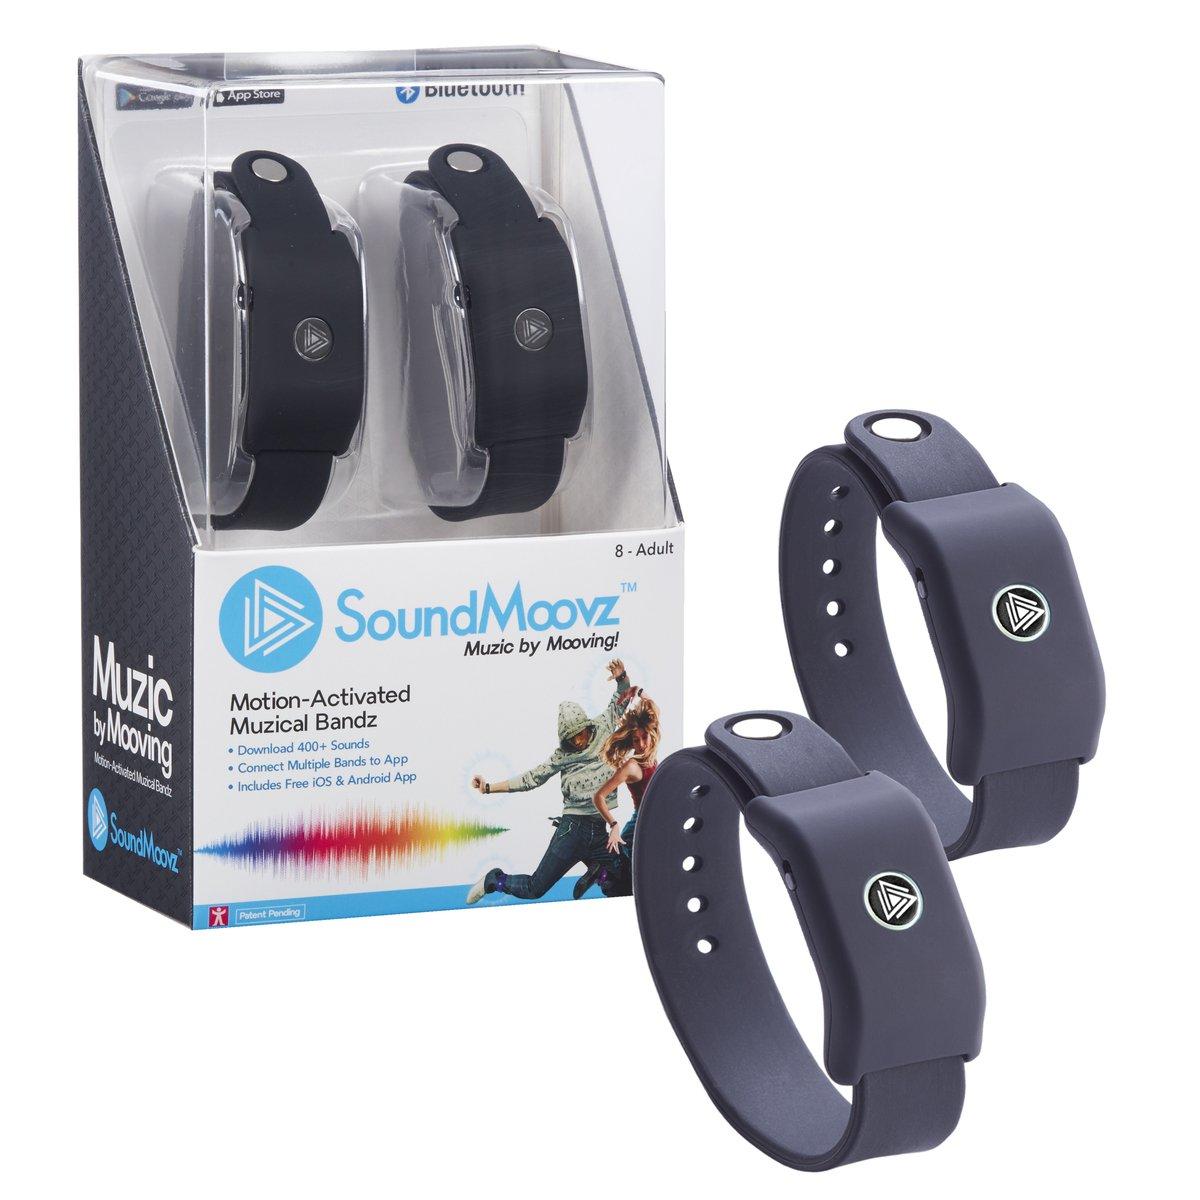 SoundMoovz (1100583)